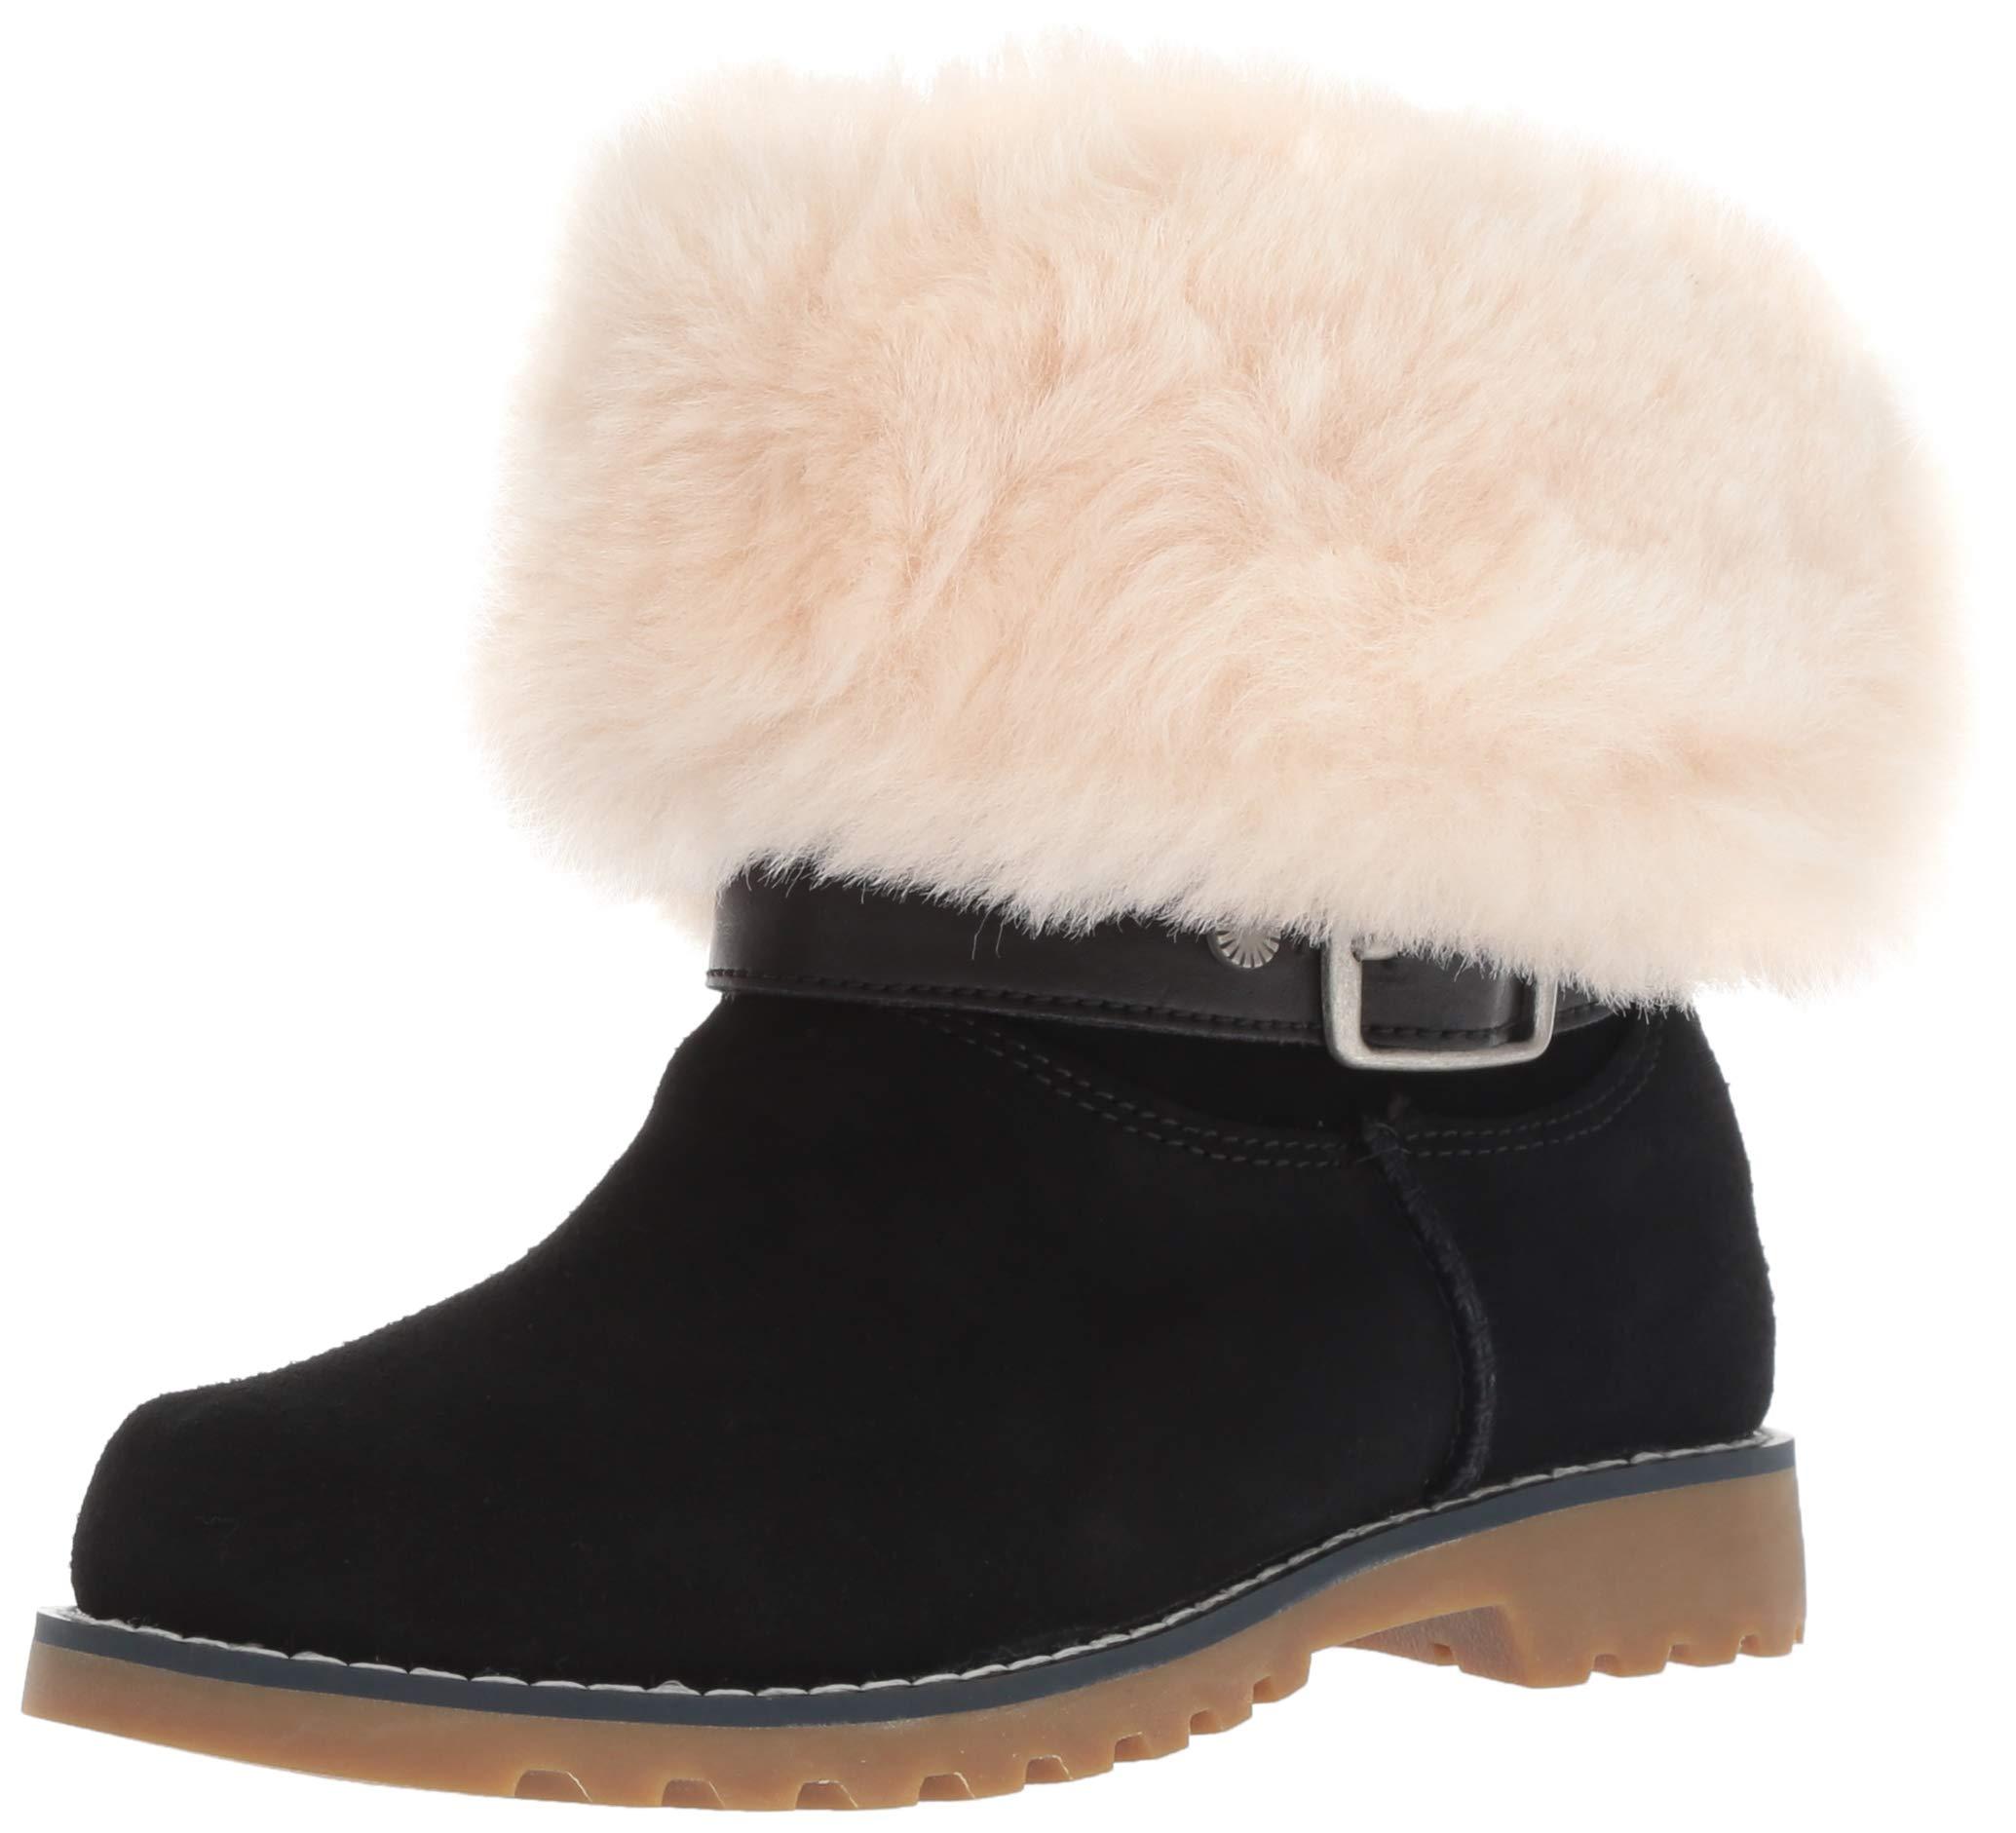 ویکالا · خرید  اصل اورجینال · خرید از آمازون · UGG Girls' K Nessa Fashion Boot, Black, 1 M US Little Kid wekala · ویکالا